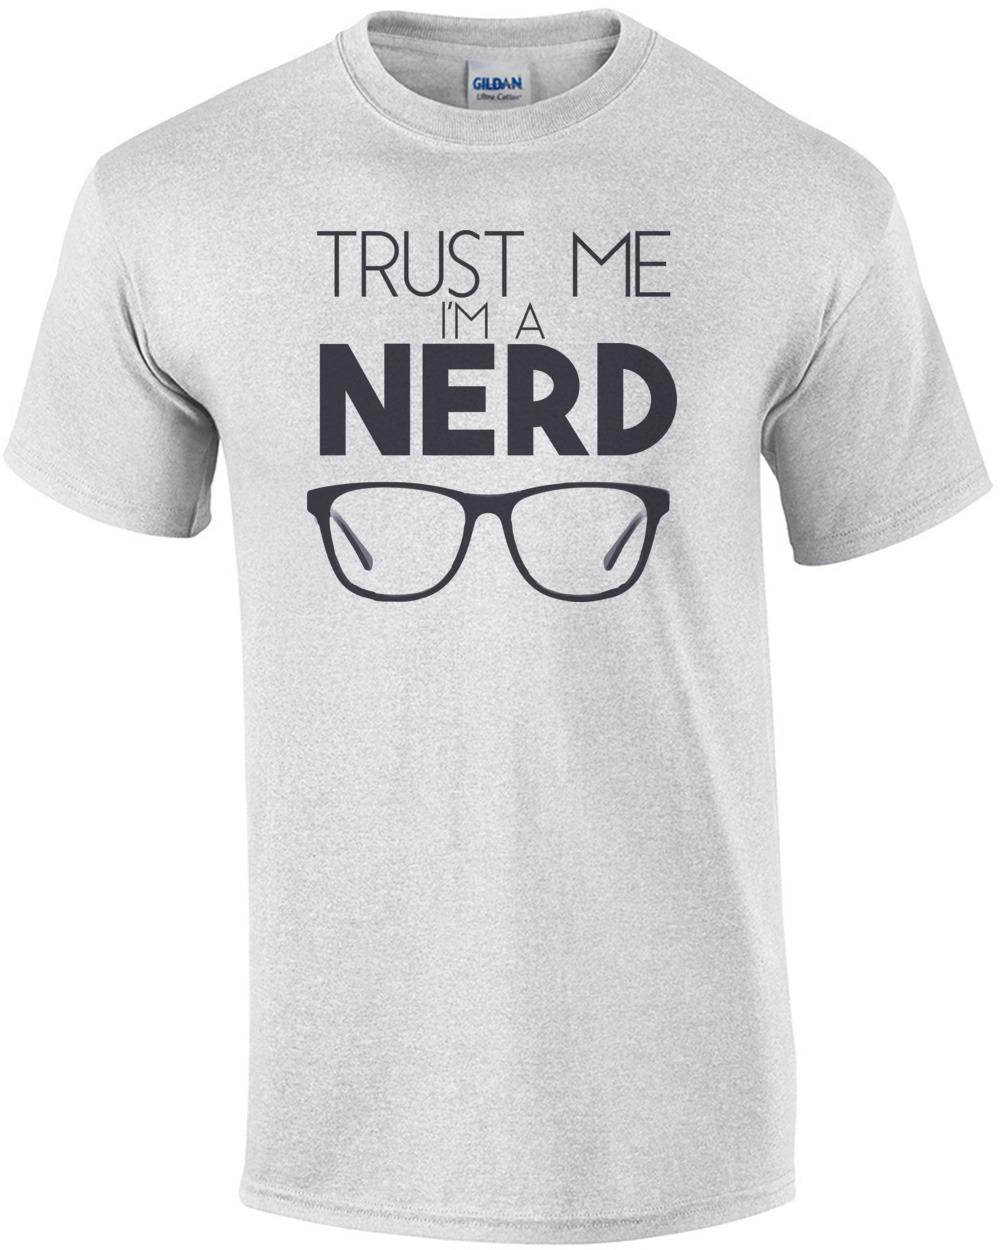 8b64ff12c Trust me i'm a nerd T-Shirt